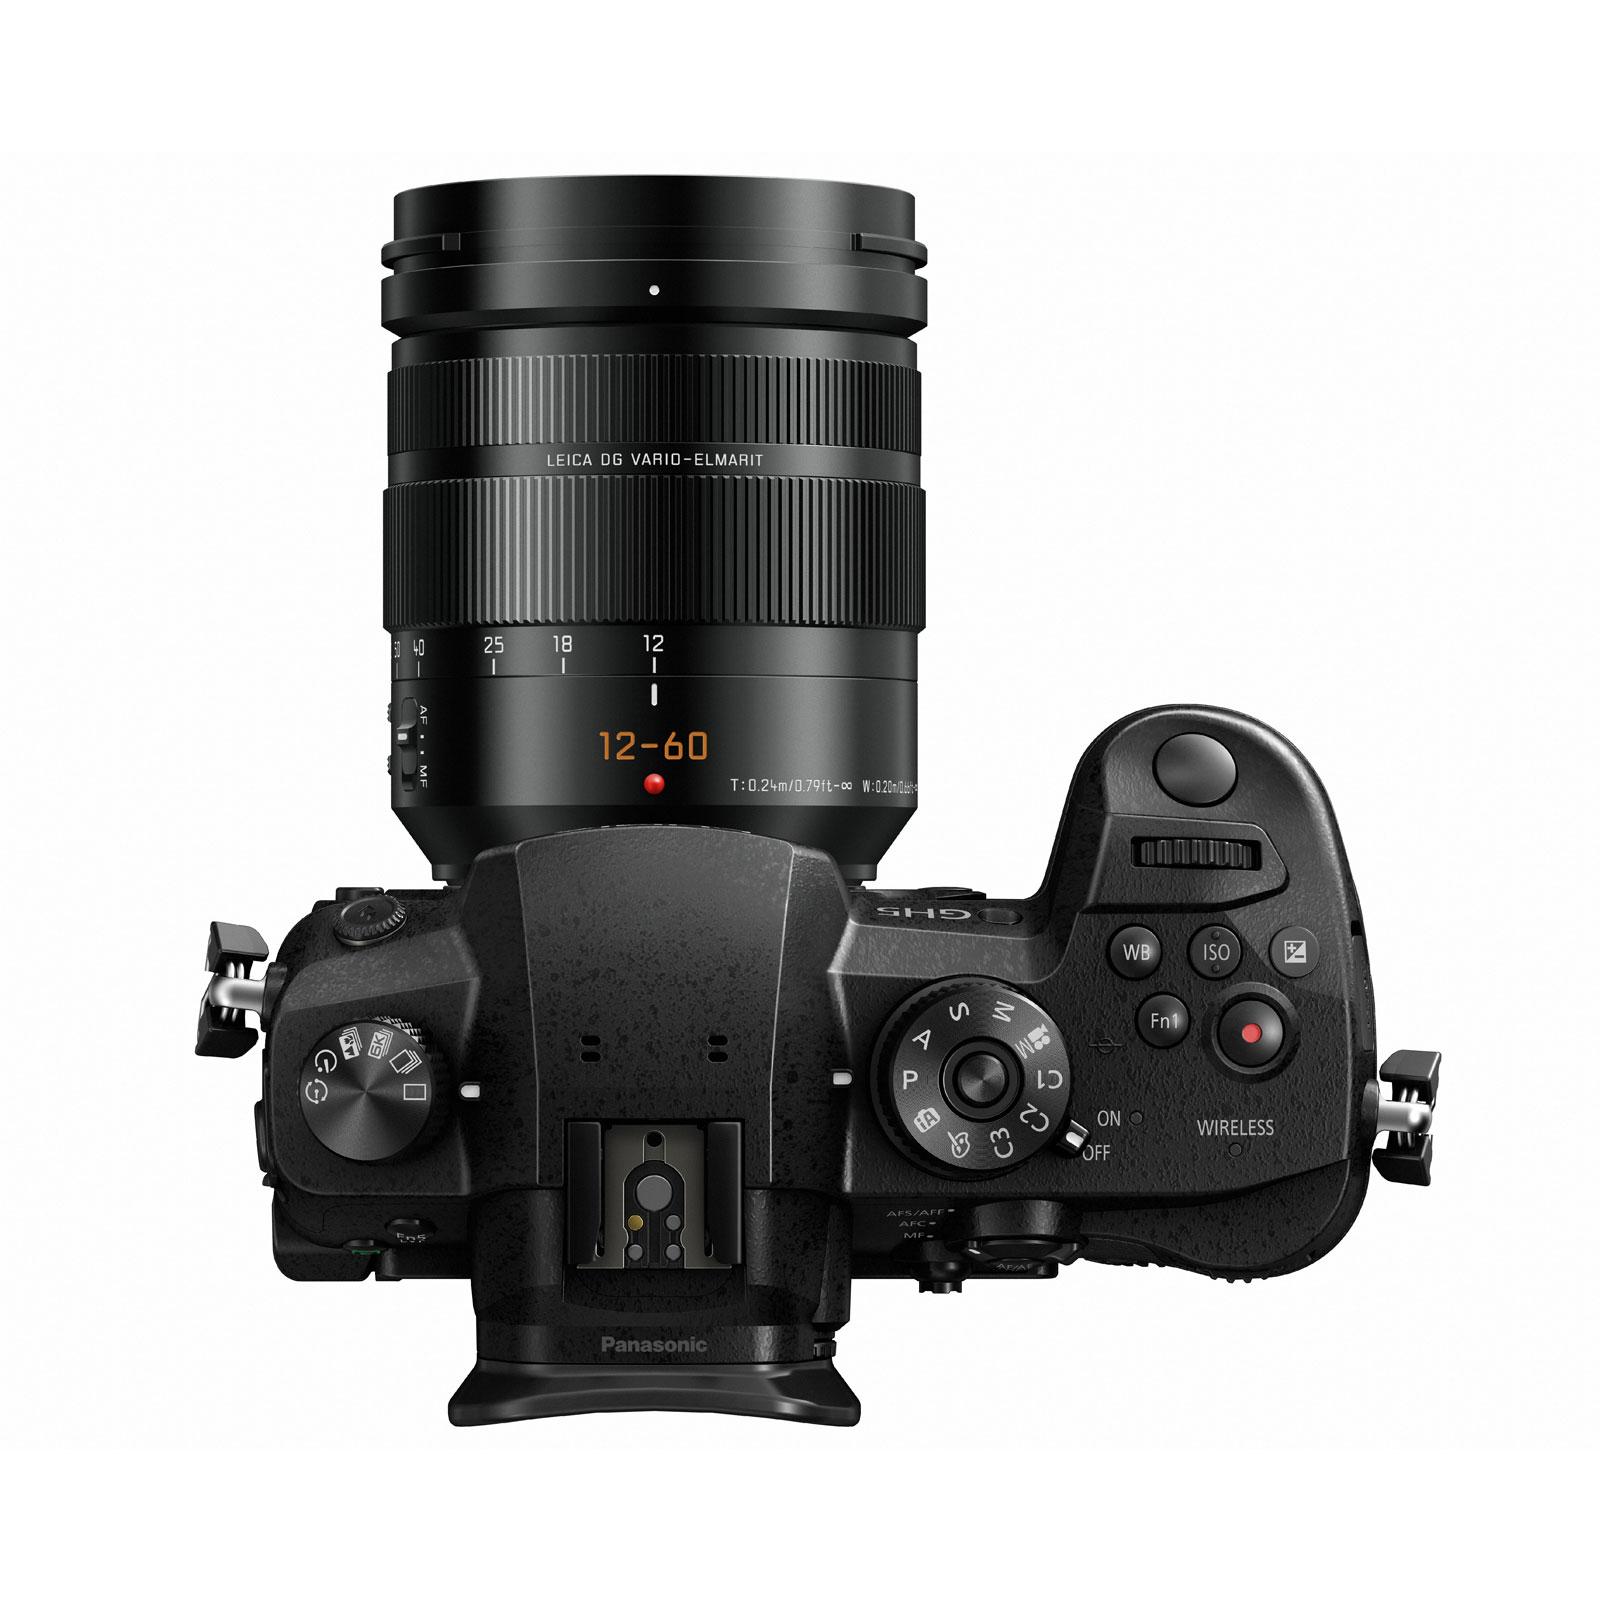 panasonic dmc gh5 leica 12 60 mm appareil photo. Black Bedroom Furniture Sets. Home Design Ideas